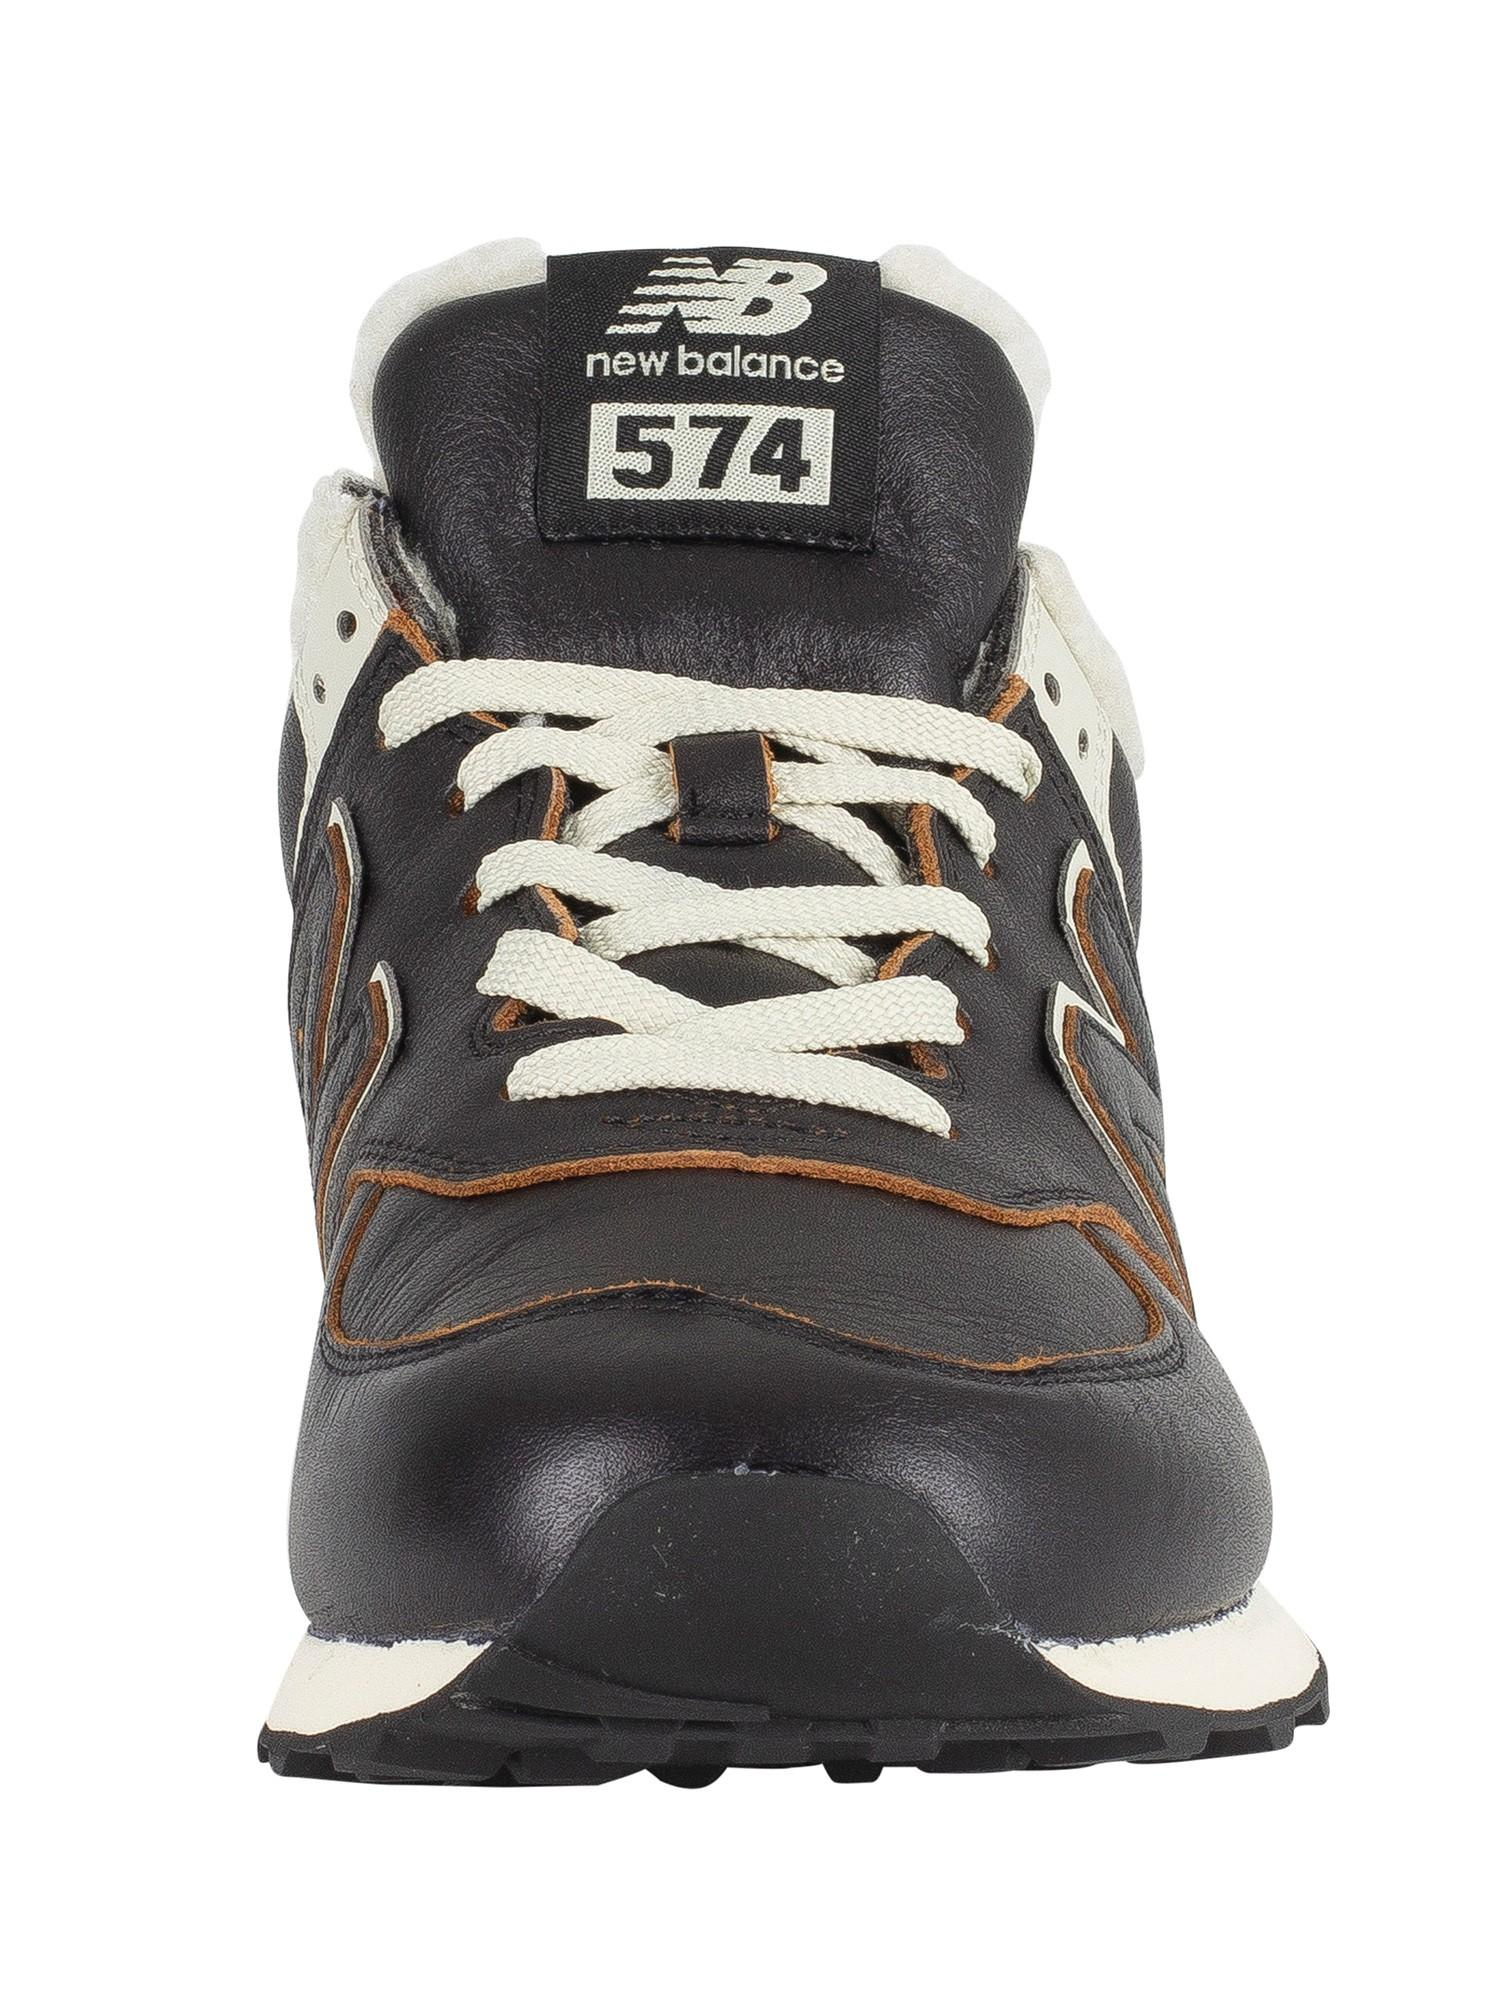 new balance dark brown 574 trainers